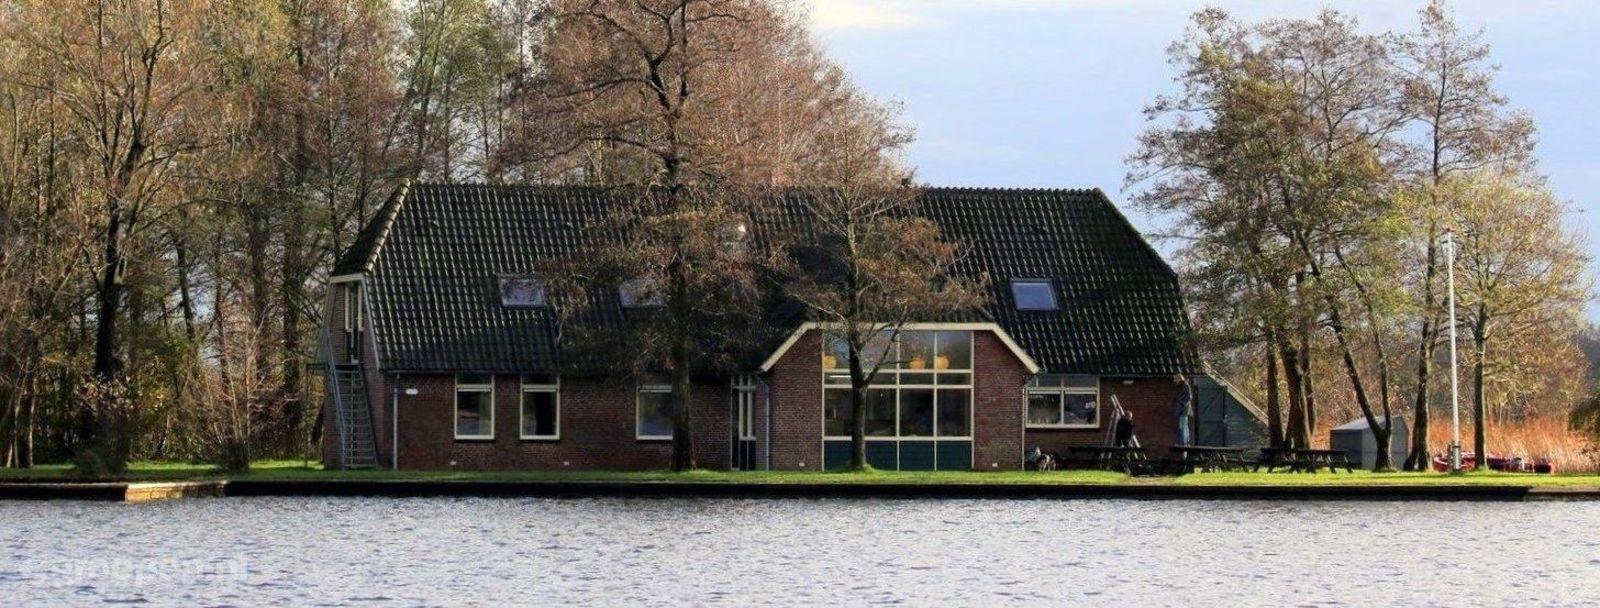 Holidayhome Giethoorn